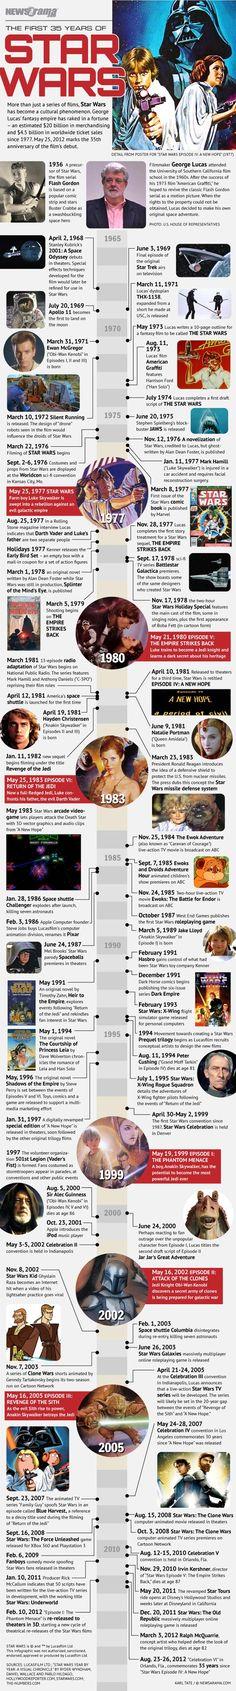 First 35 Years of STAR WARS [Infographic] | GeekTyrant #starwars